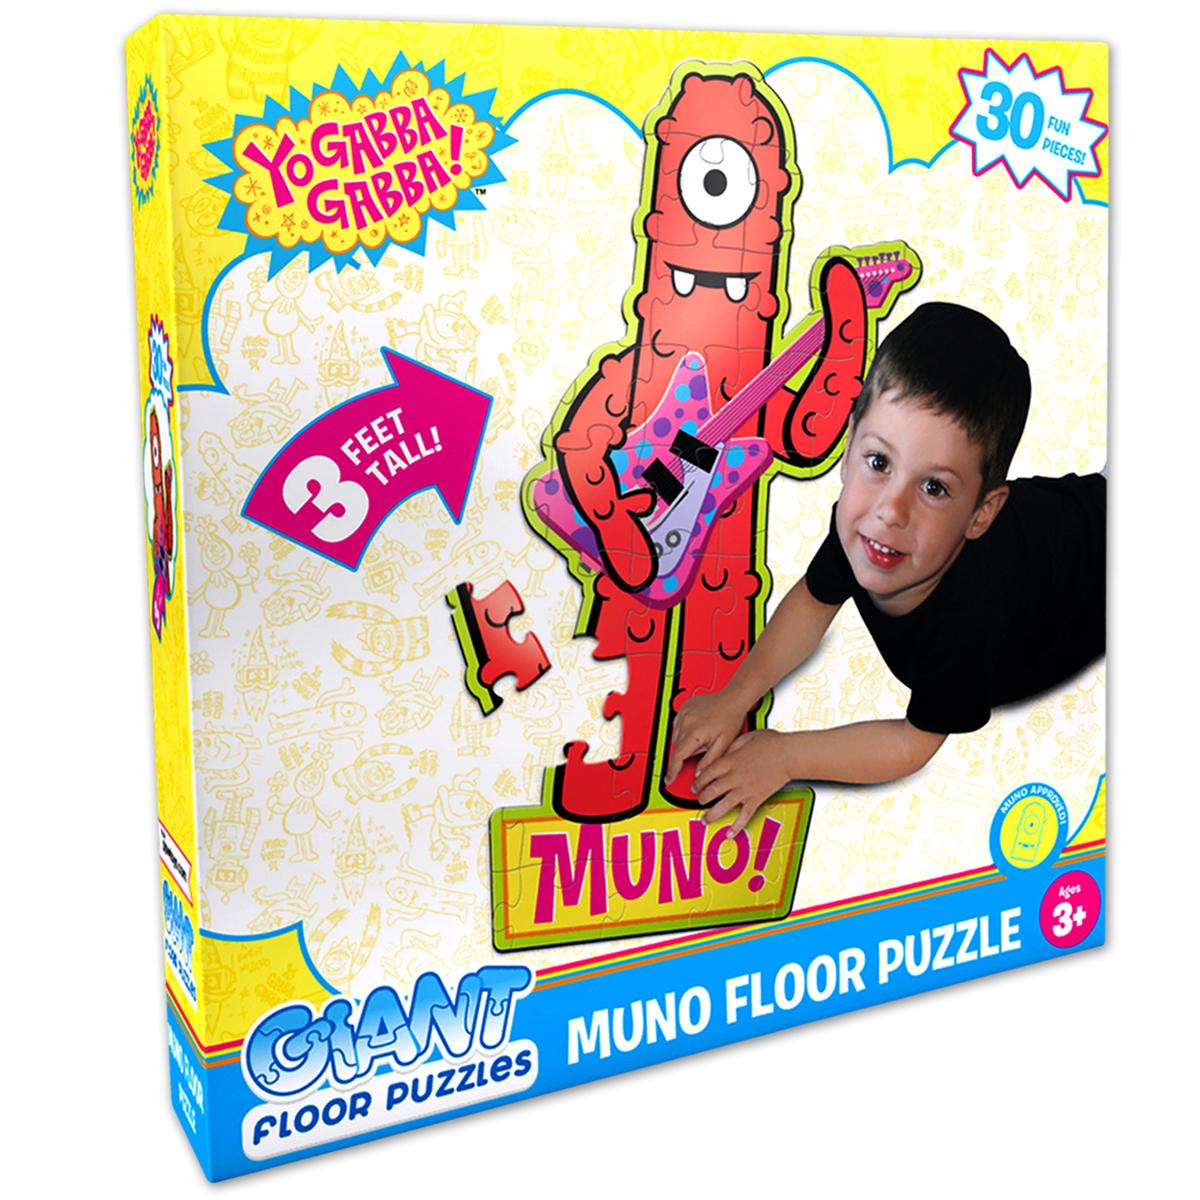 Yo Gabba Gabba! Muno Giant Floor Puzzle